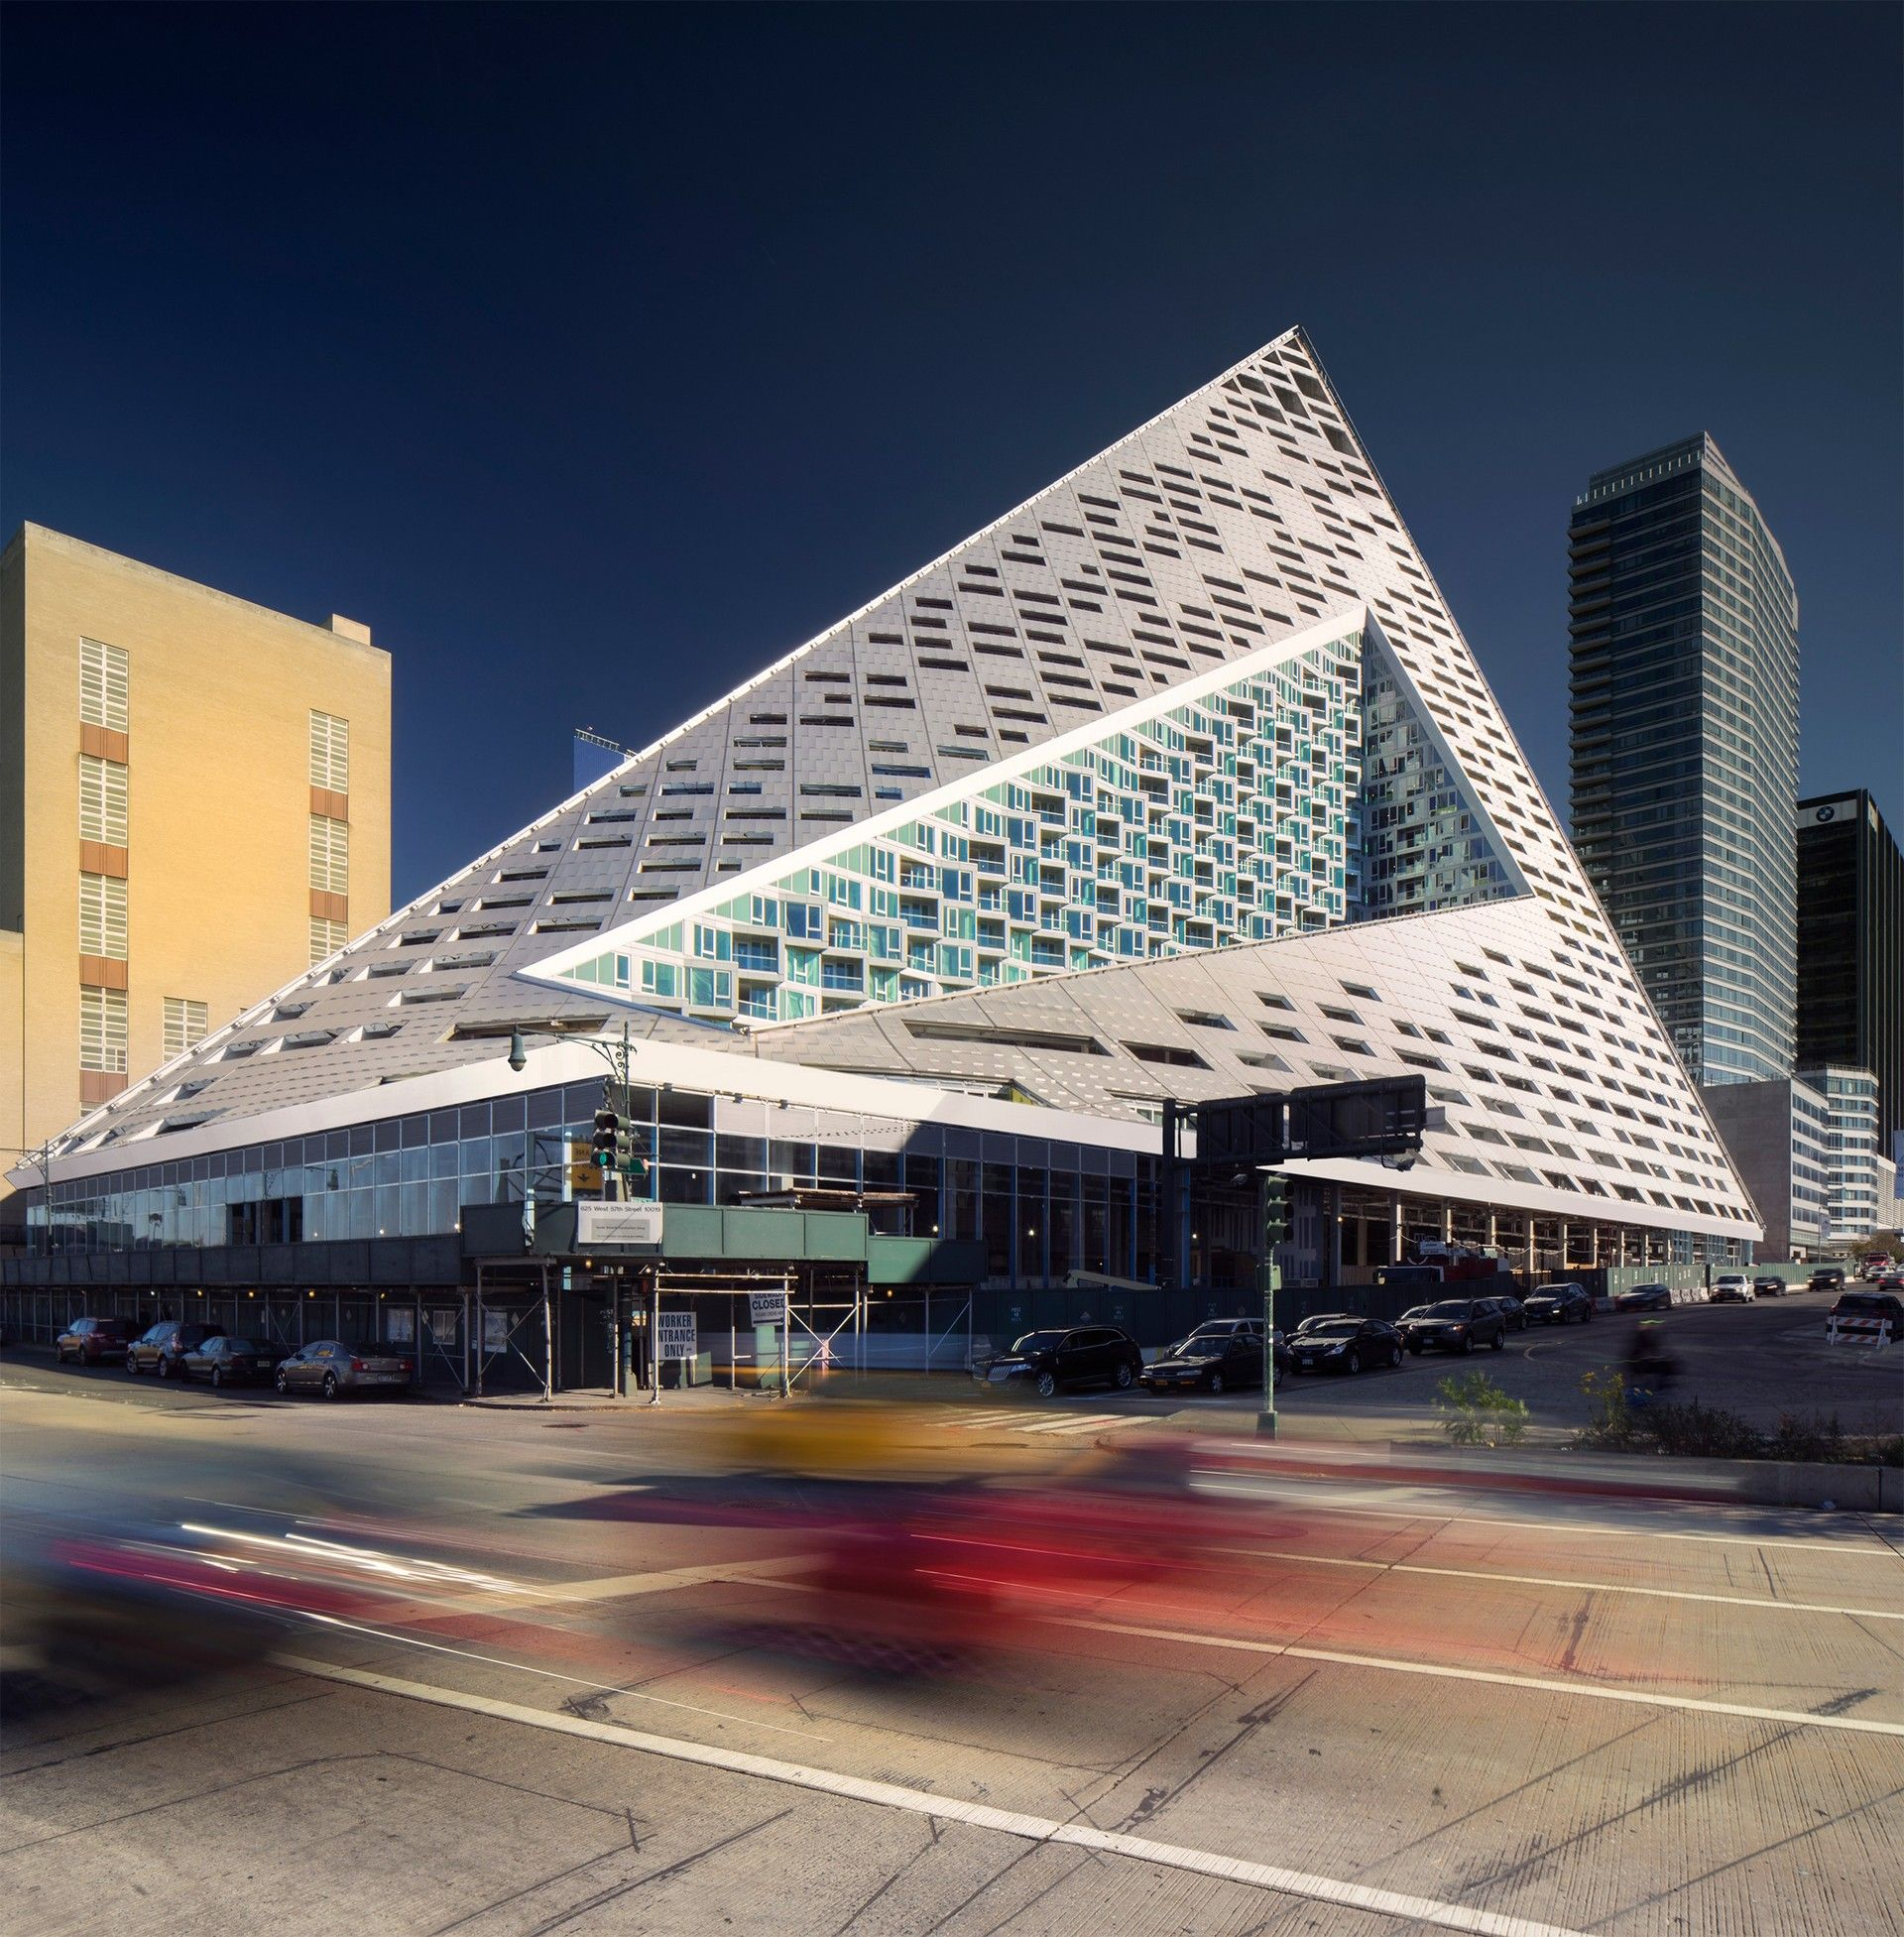 Via 57 West Big Bjarke Ingels Group Decospan Squint Opera Archello Architecture Futuristic Architecture Big Architects